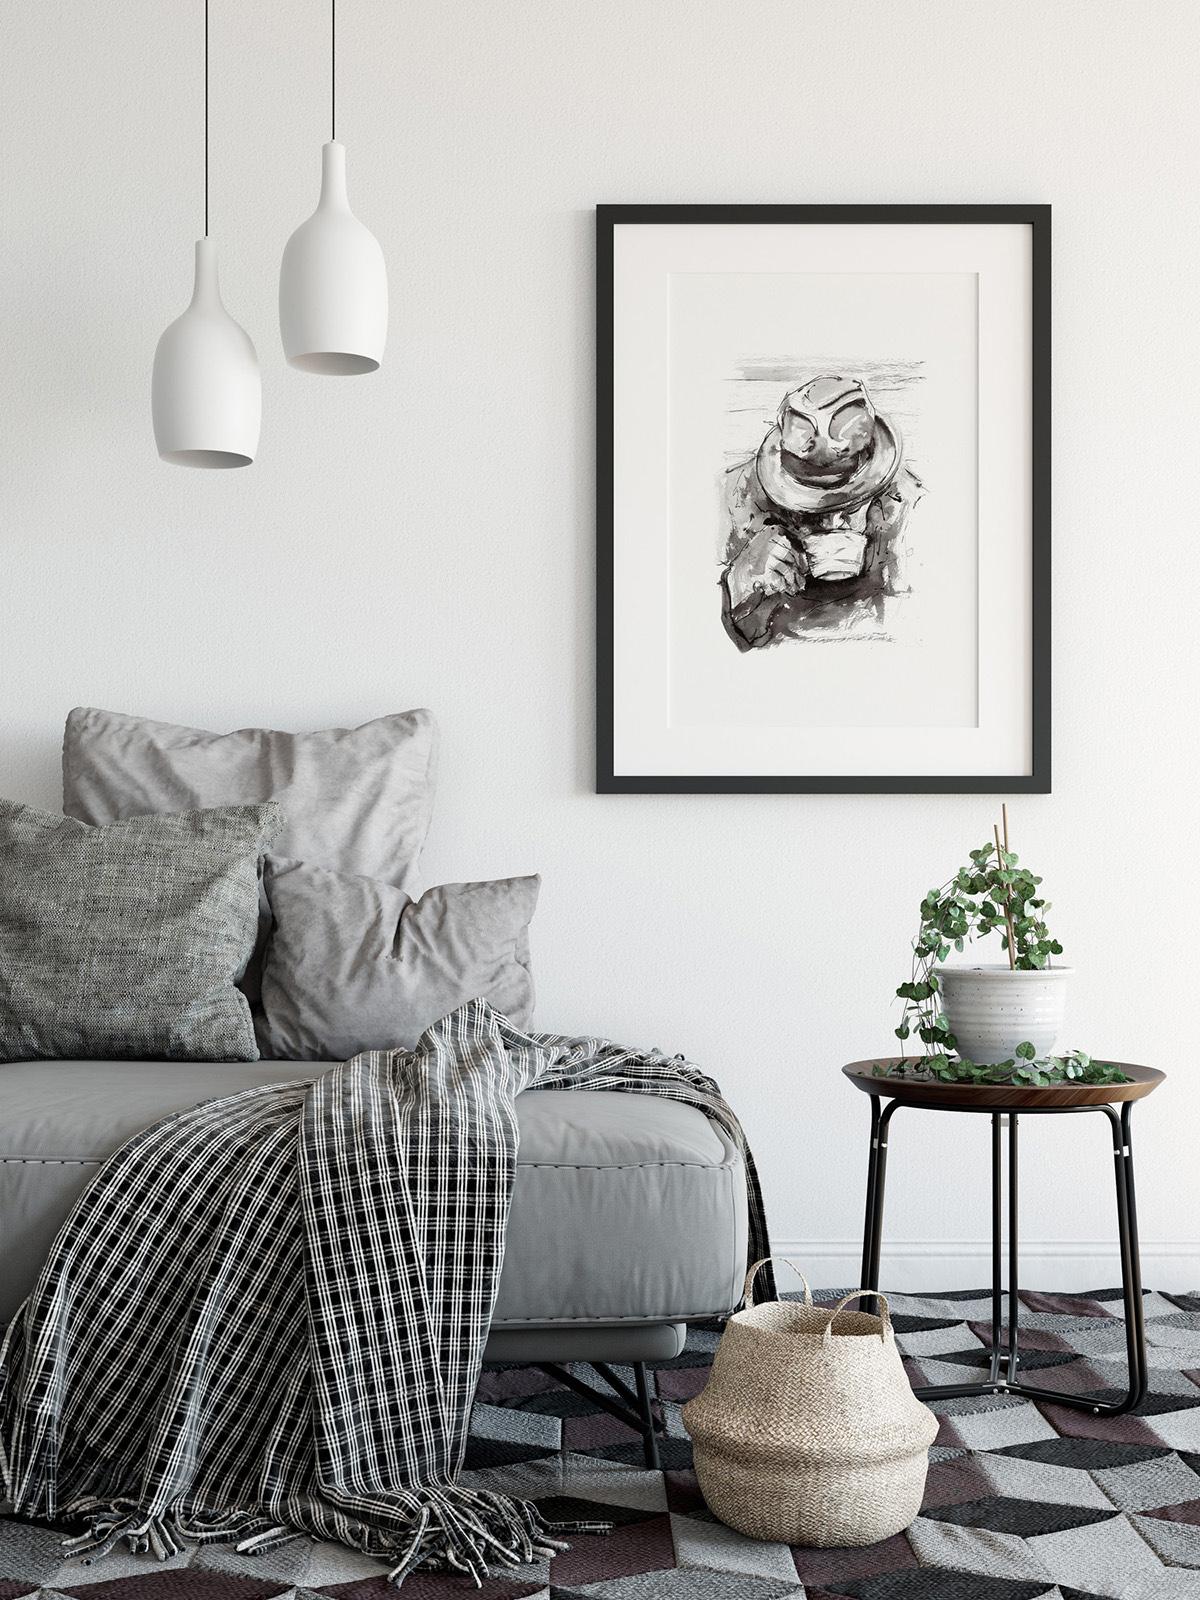 'Man with Tea'.  Fine Art Print by Artist, Dana Trijbetz.  Original Ink Painting made as a Giclée Print on 100% Cotton Paper.  Image 3 of 4.jpg